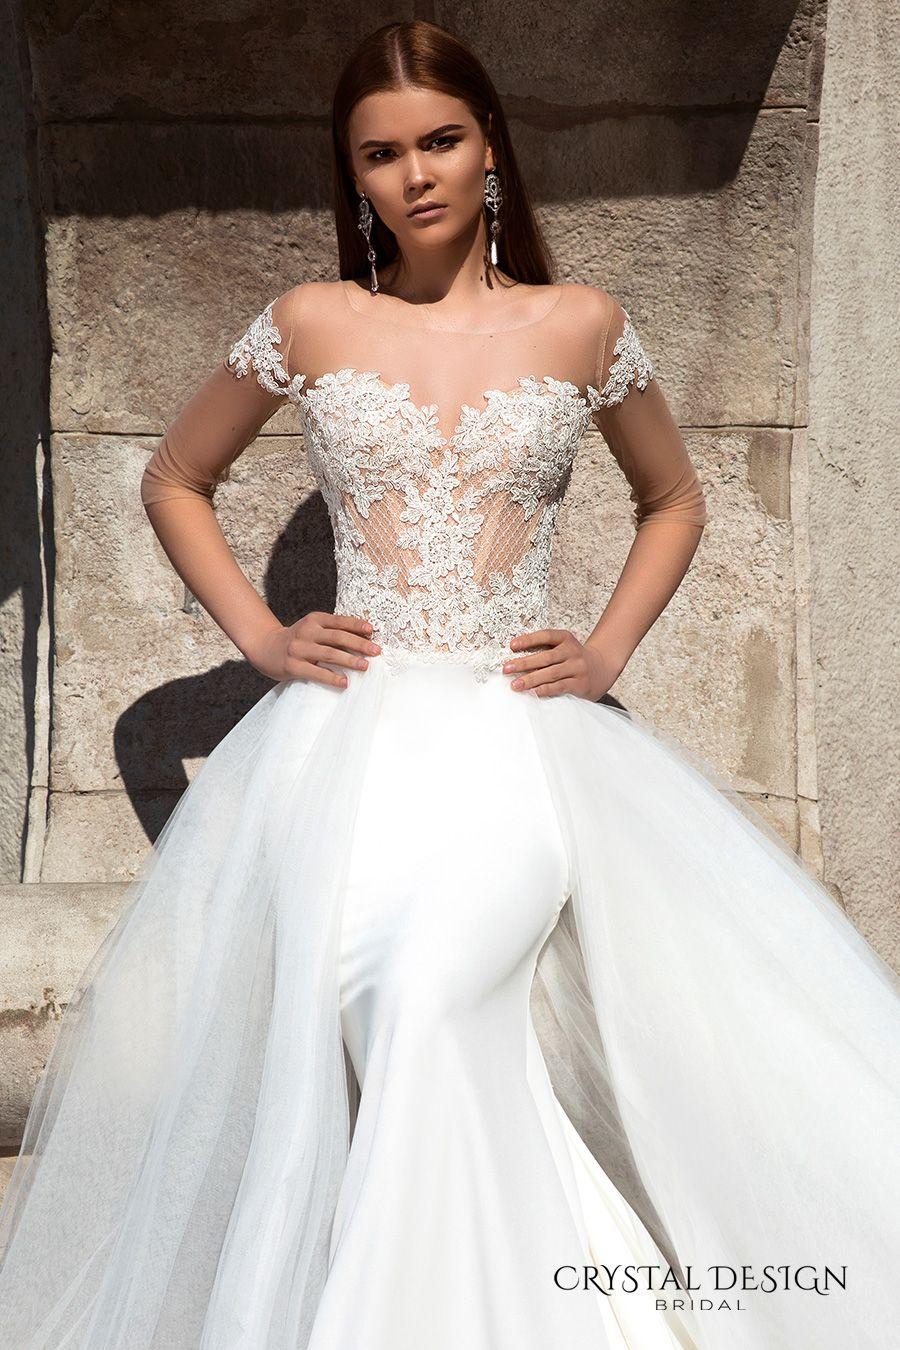 Popular crystal design bridal off the shoulder sweetheart neckline lace bodice glamorous sheath wedding dress a